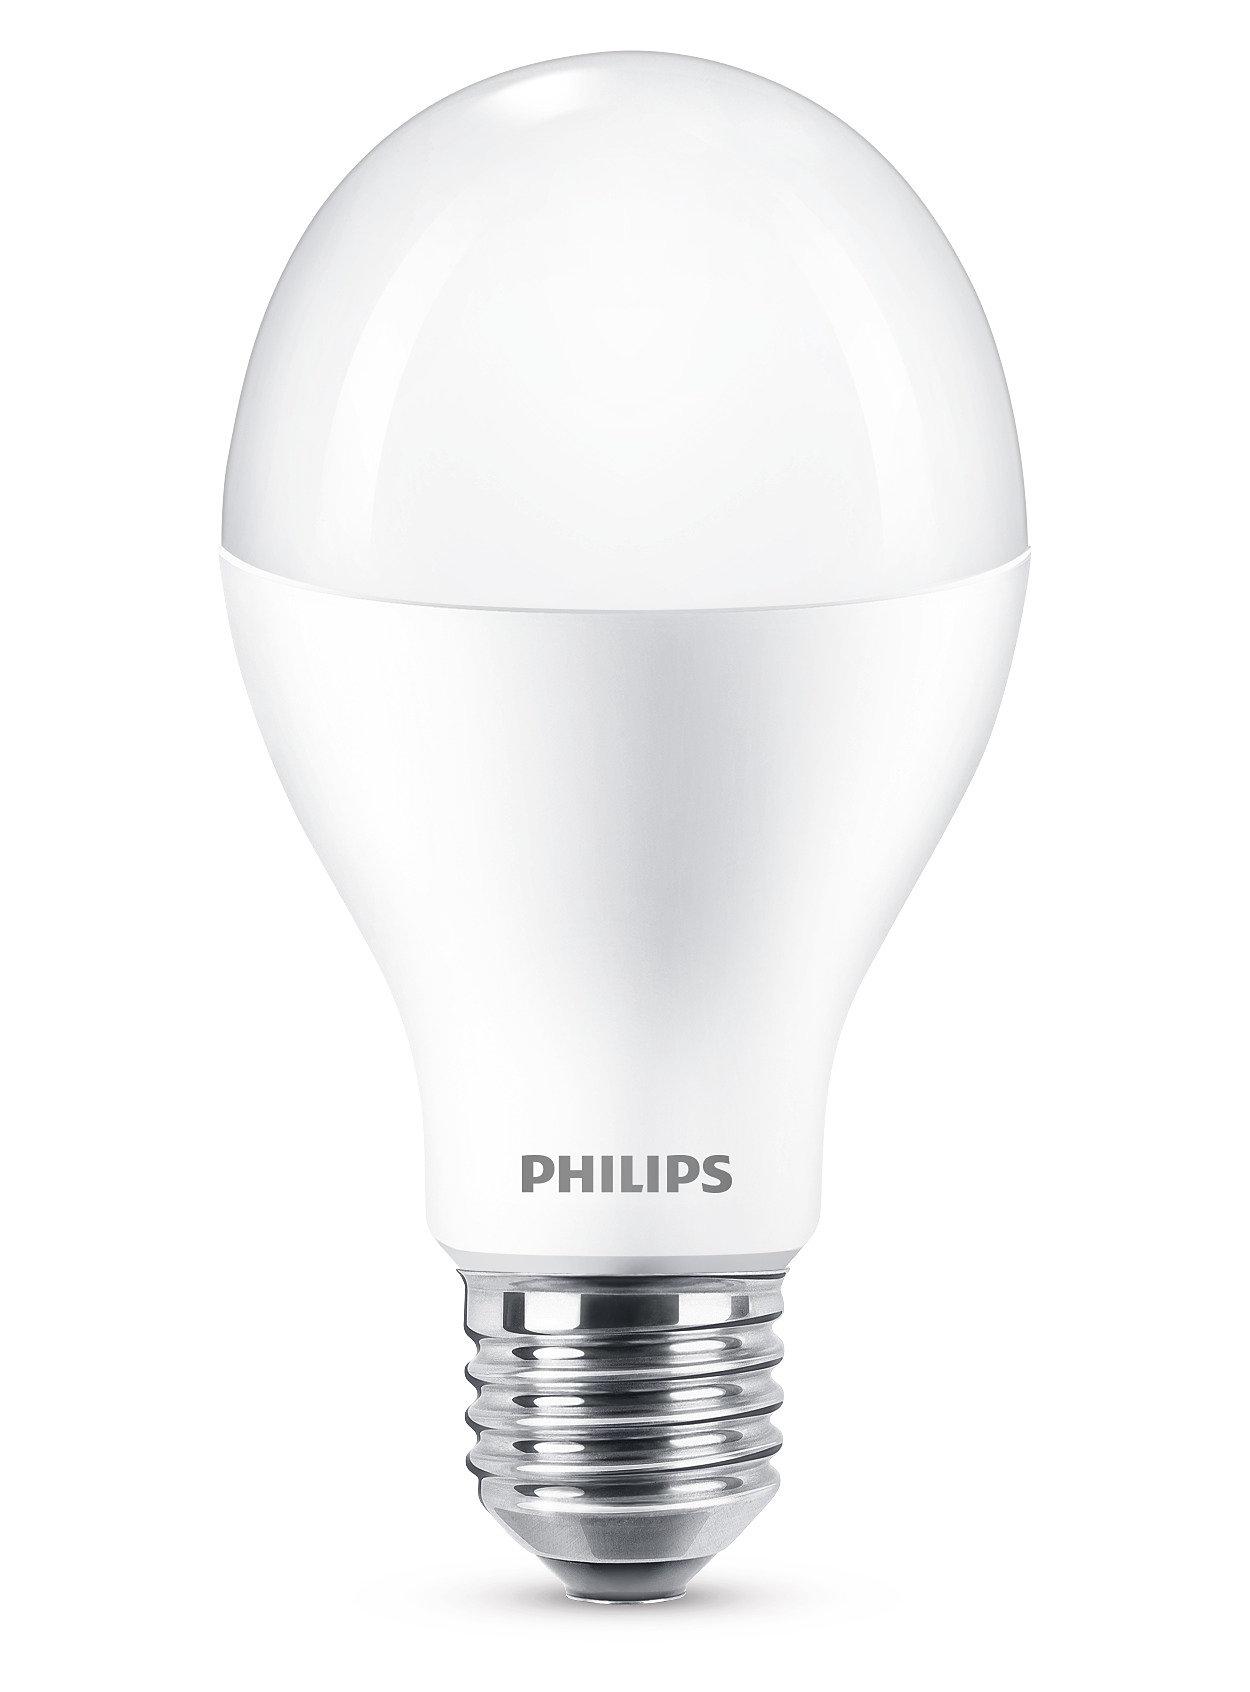 Lampadina bianca calda con luce di eccellente qualità